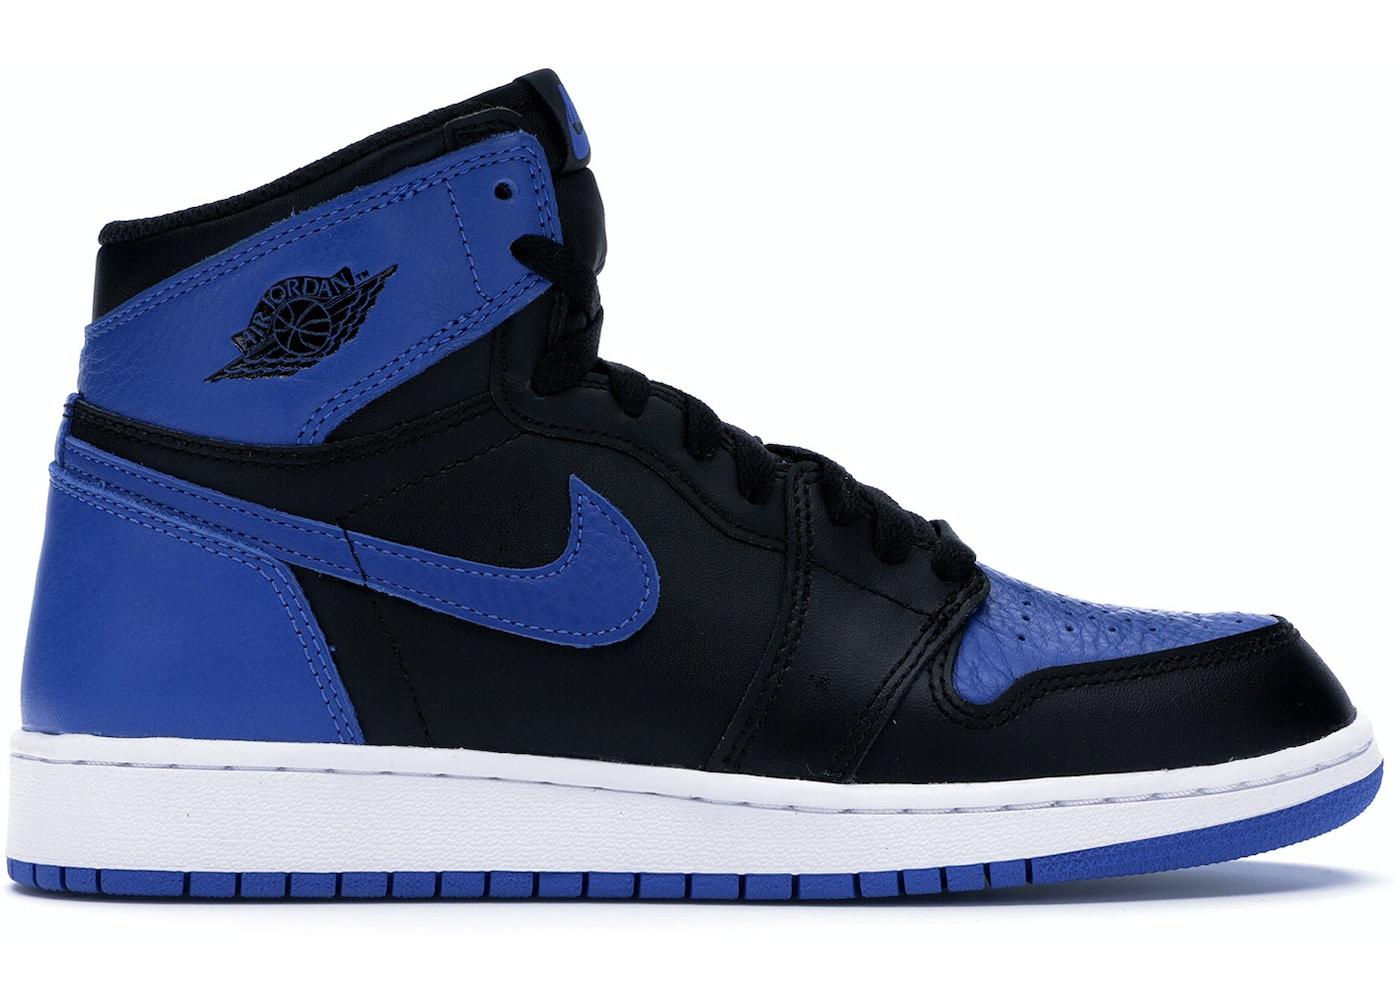 online store 49c83 5307e Jordan 1 Retro Royal 2017 (GS) - 575441-007